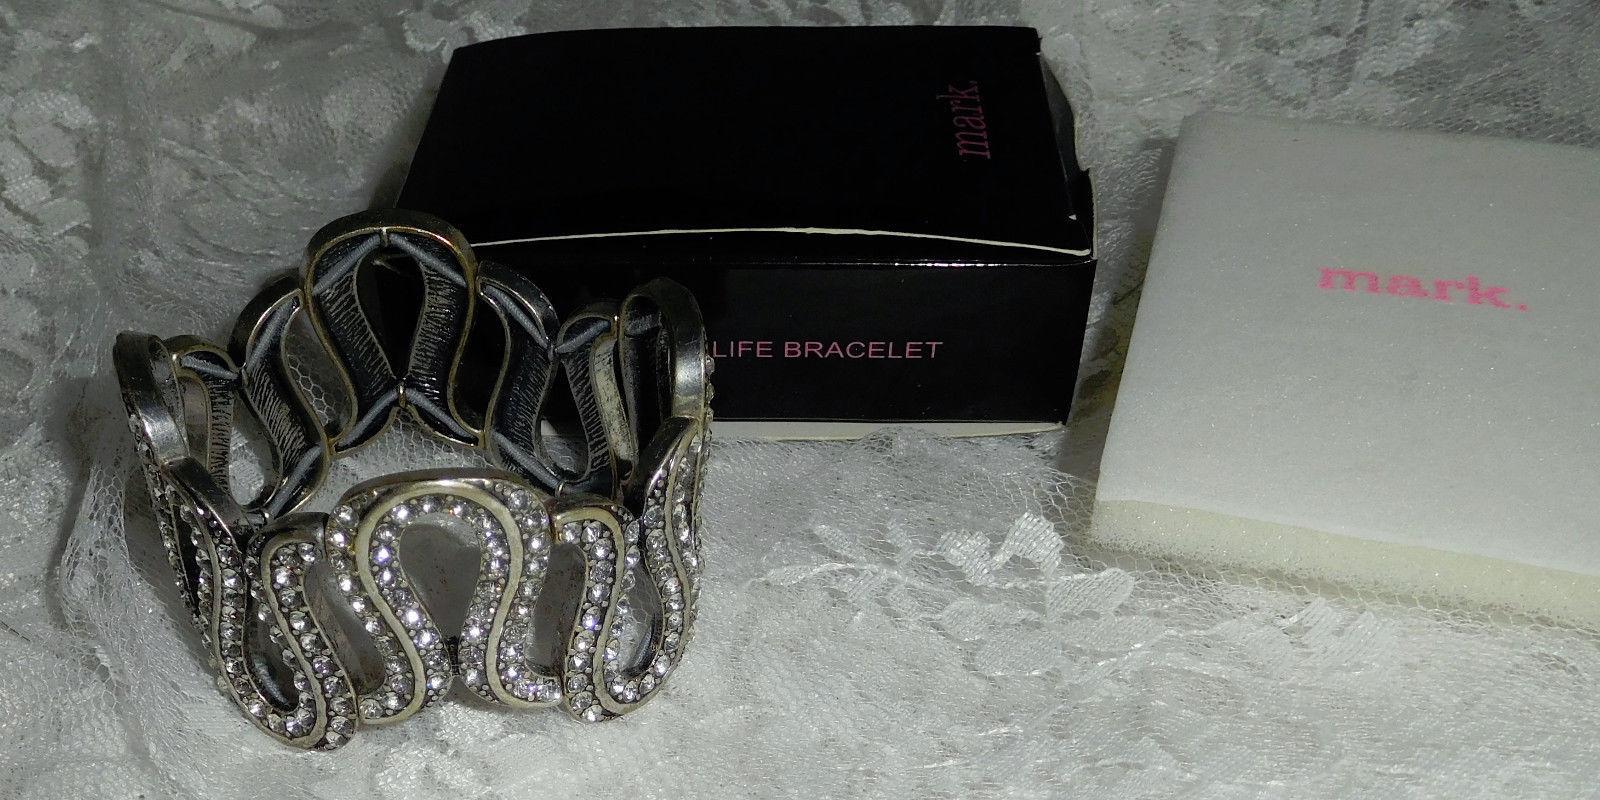 "Mark Glamorous Life Bracelet - 1 1/4"" tall - Stretch - OSFM - New in Box!"